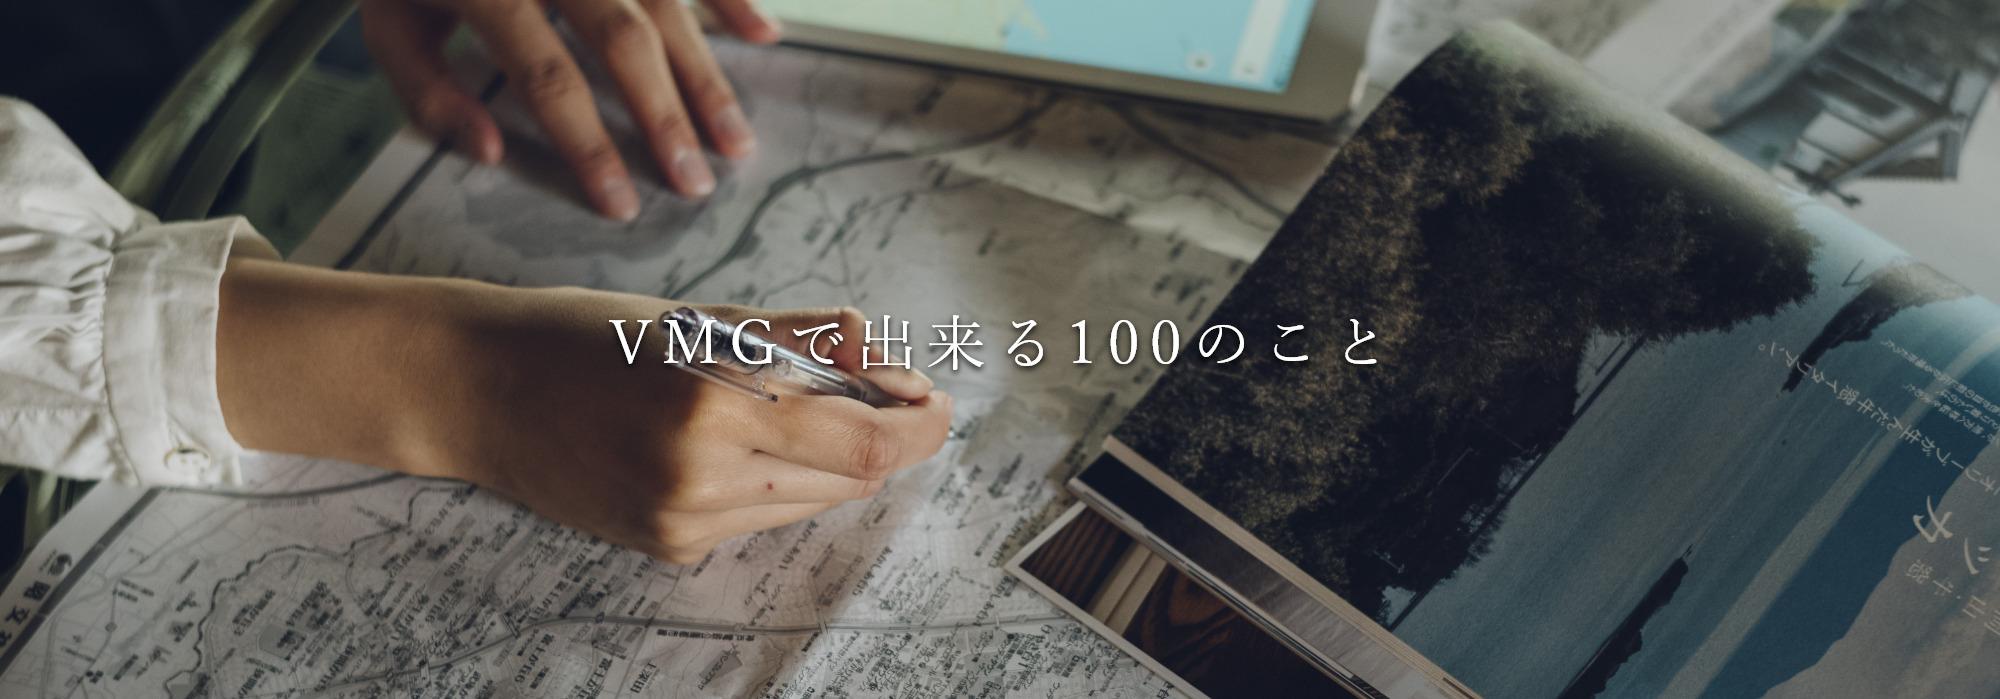 VMGでできる100のこと